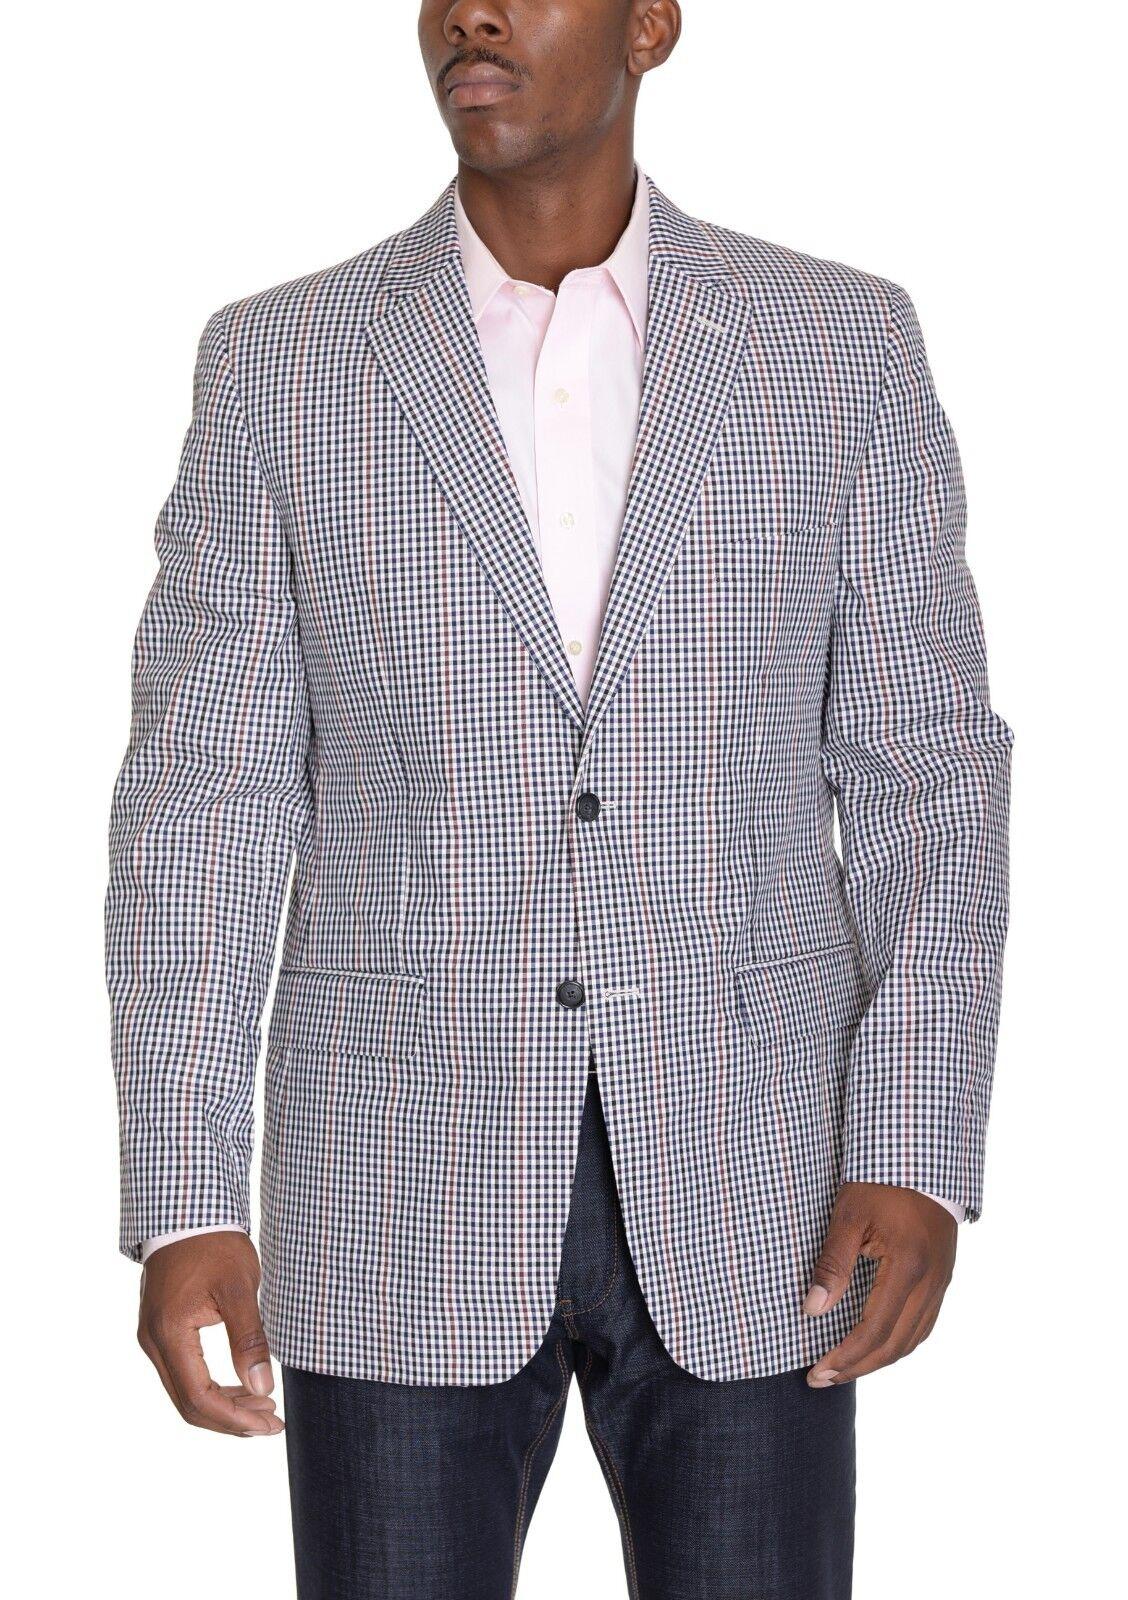 Macy's Club Room Blau rot Cream Plaid Cotton Two Button Summer Sportcoat 40S